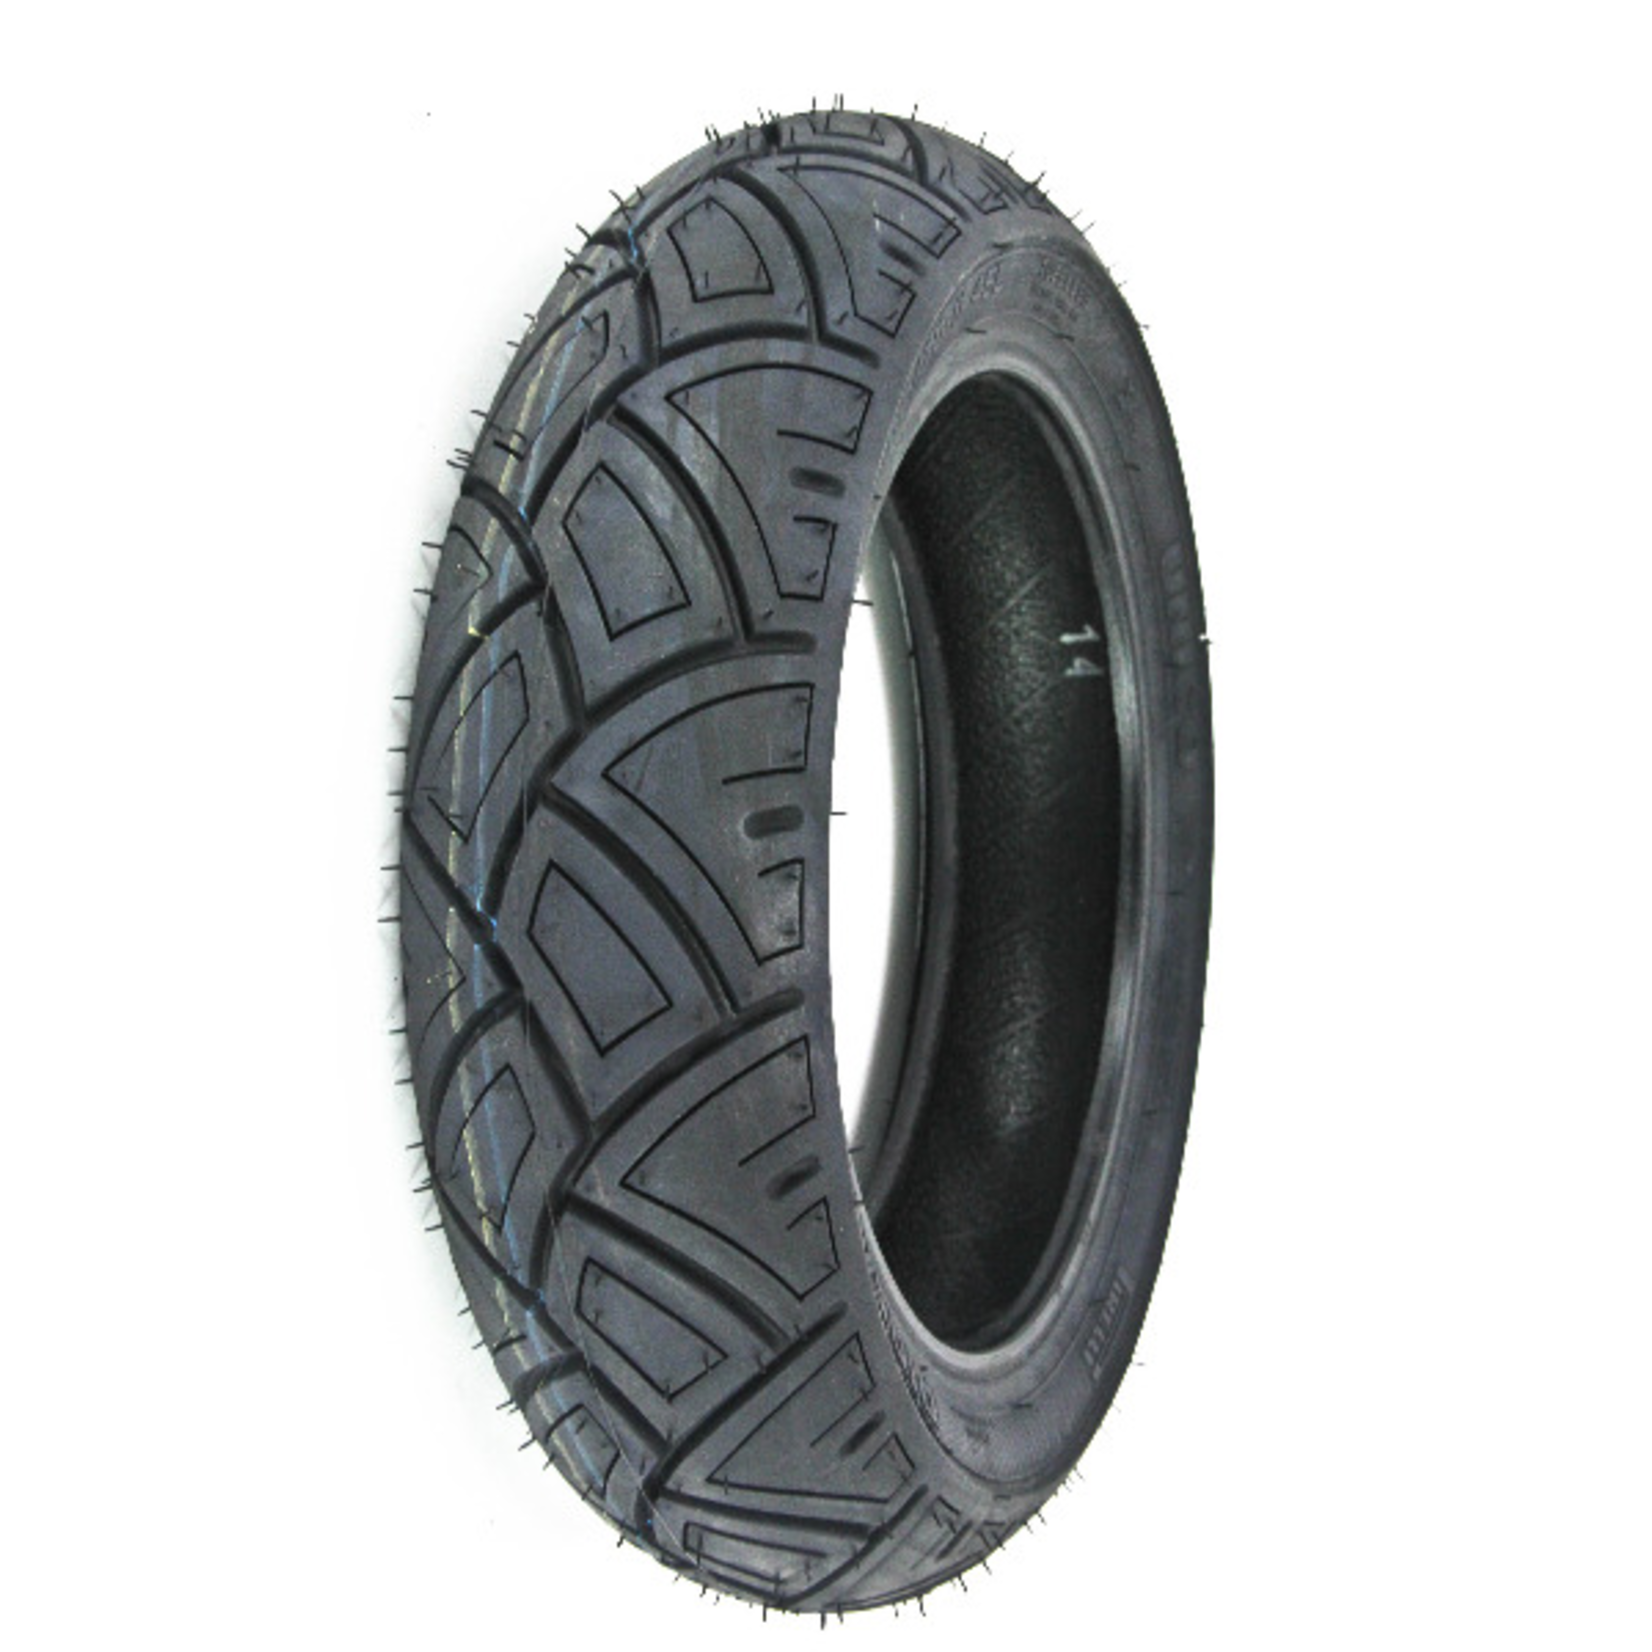 Parts Tire, 120/70-10 Pirelli SL38